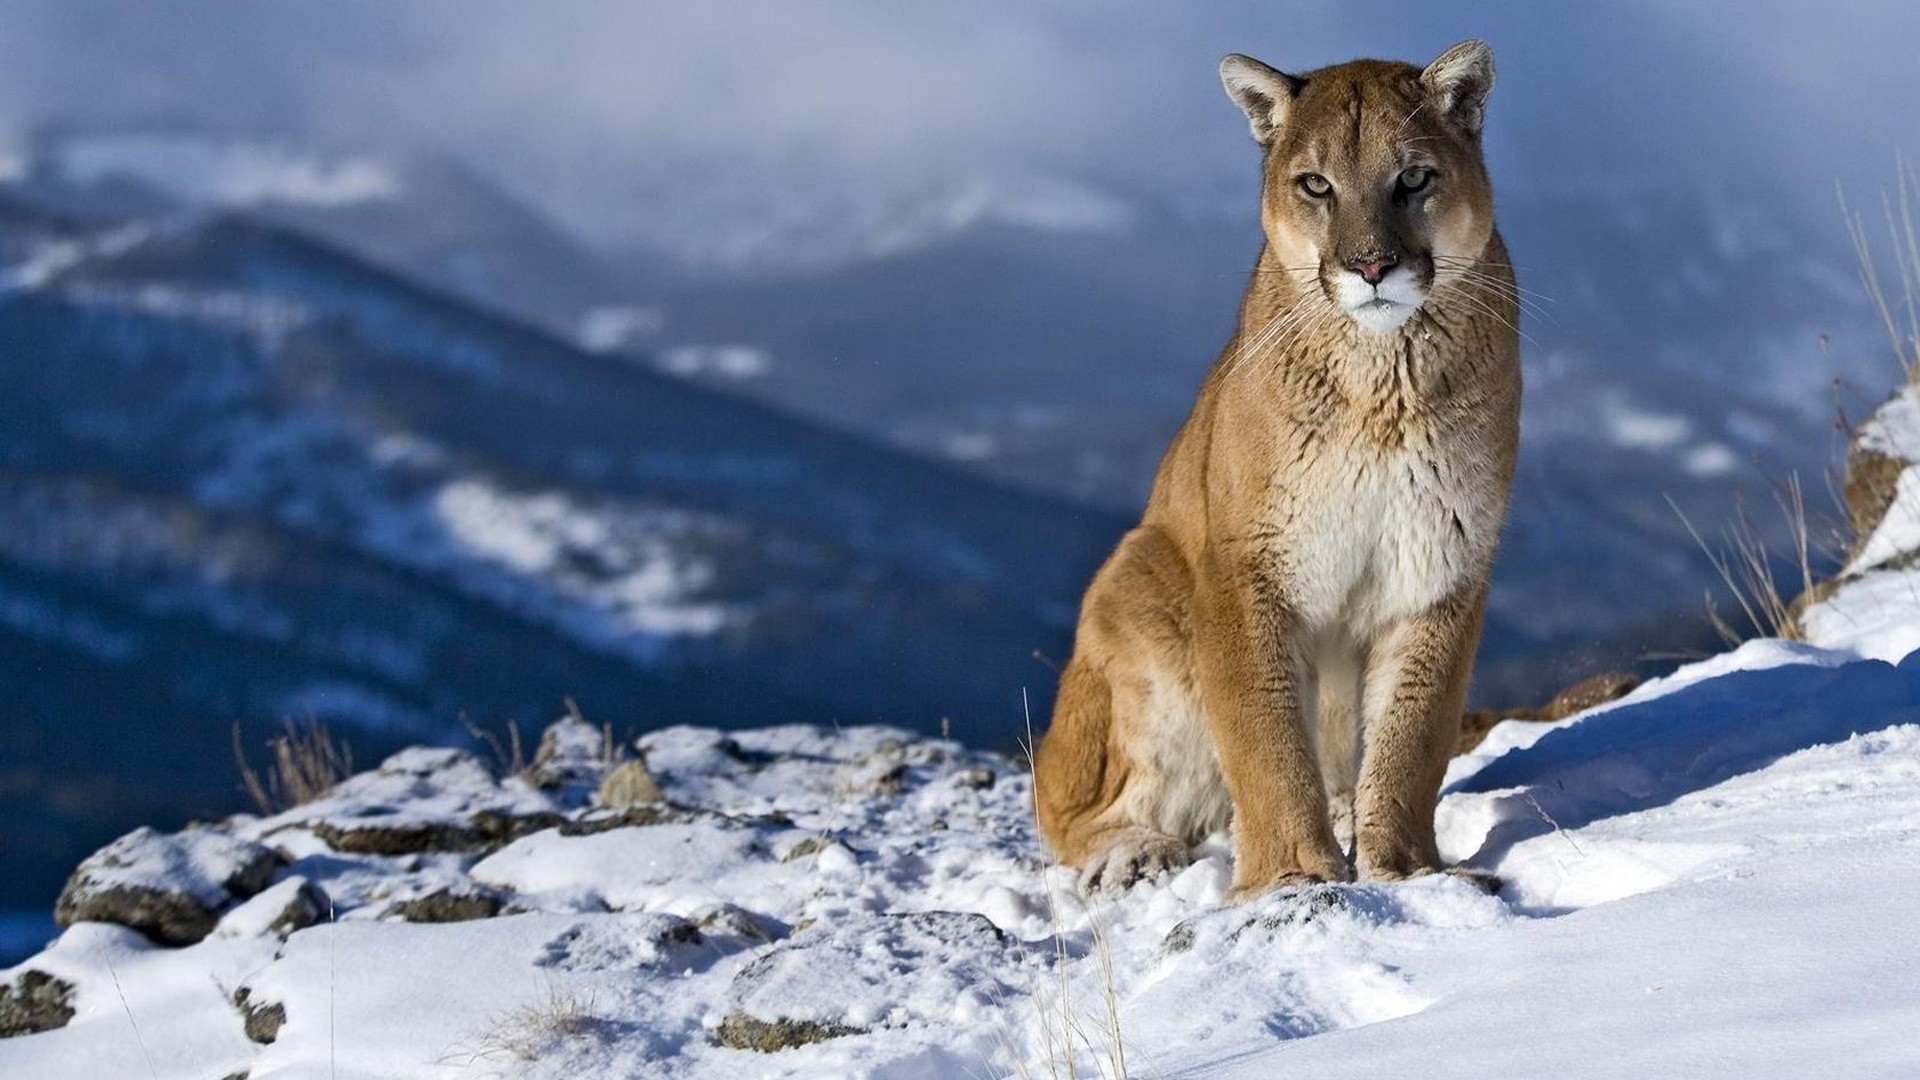 cougar_snow_mountain_sit_pretty_17057_1920x1080.jpg